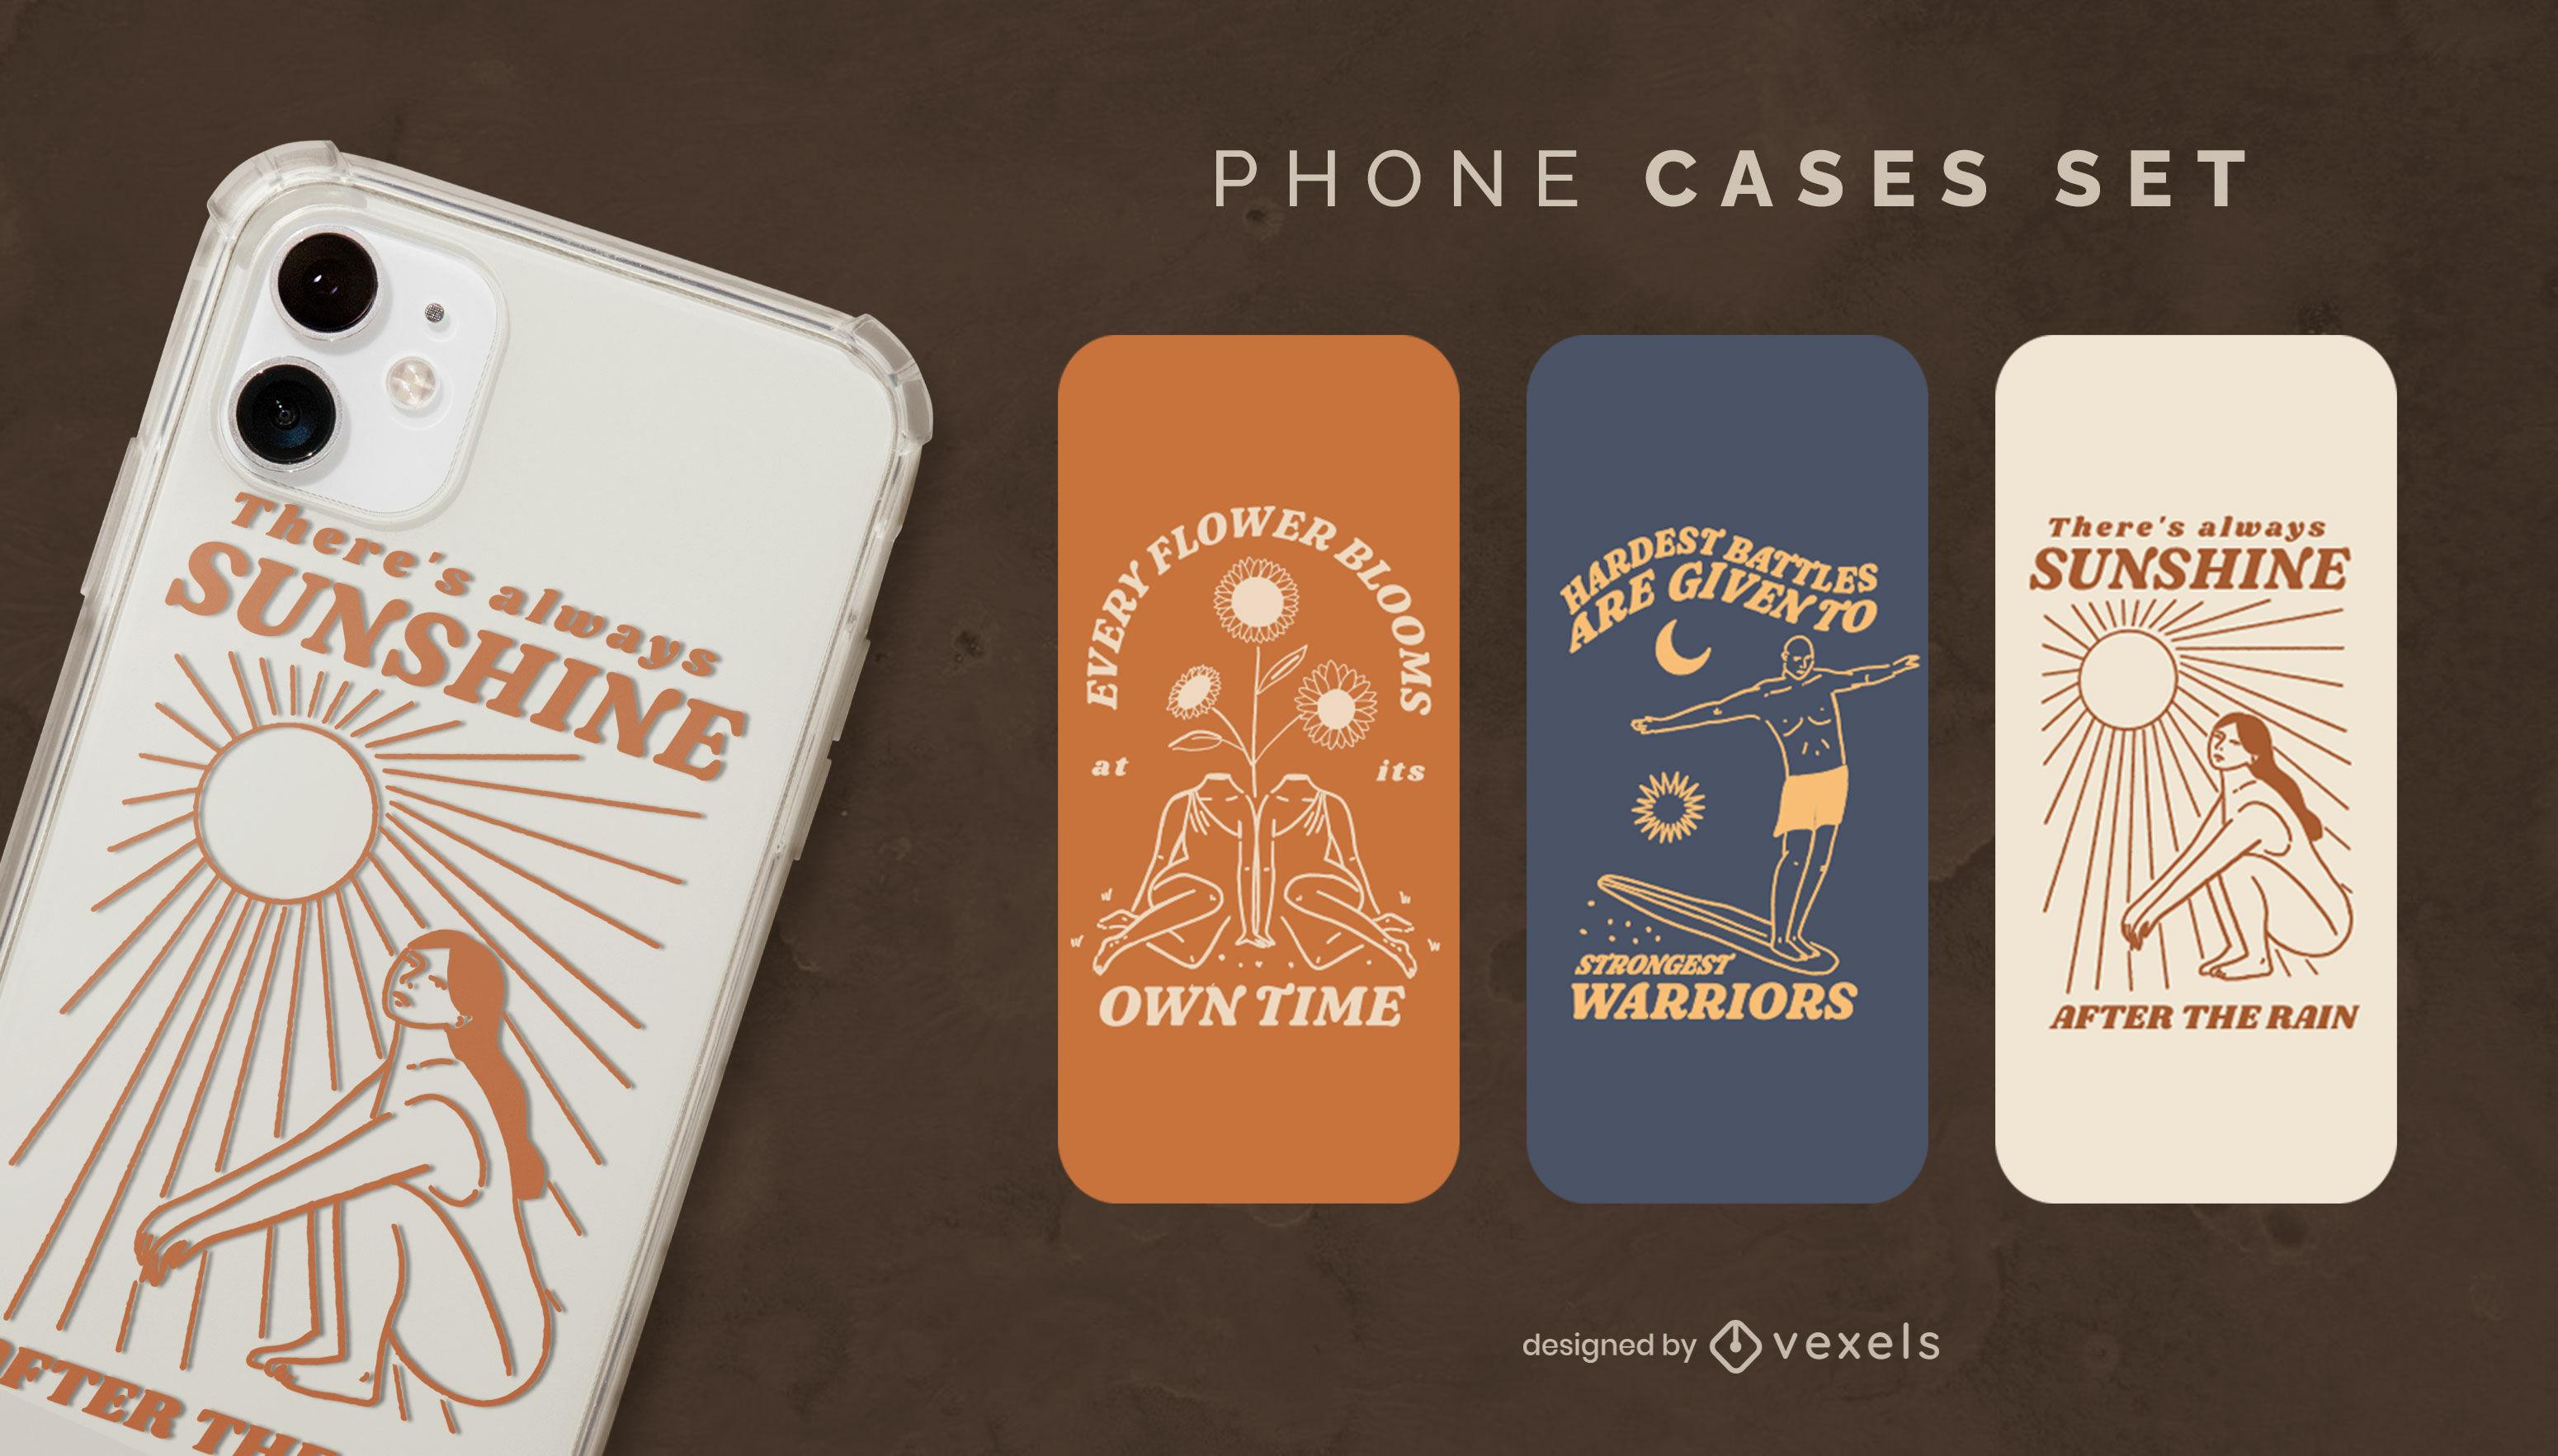 Cooles Design für Neurodiversitäts-Telefonhüllen